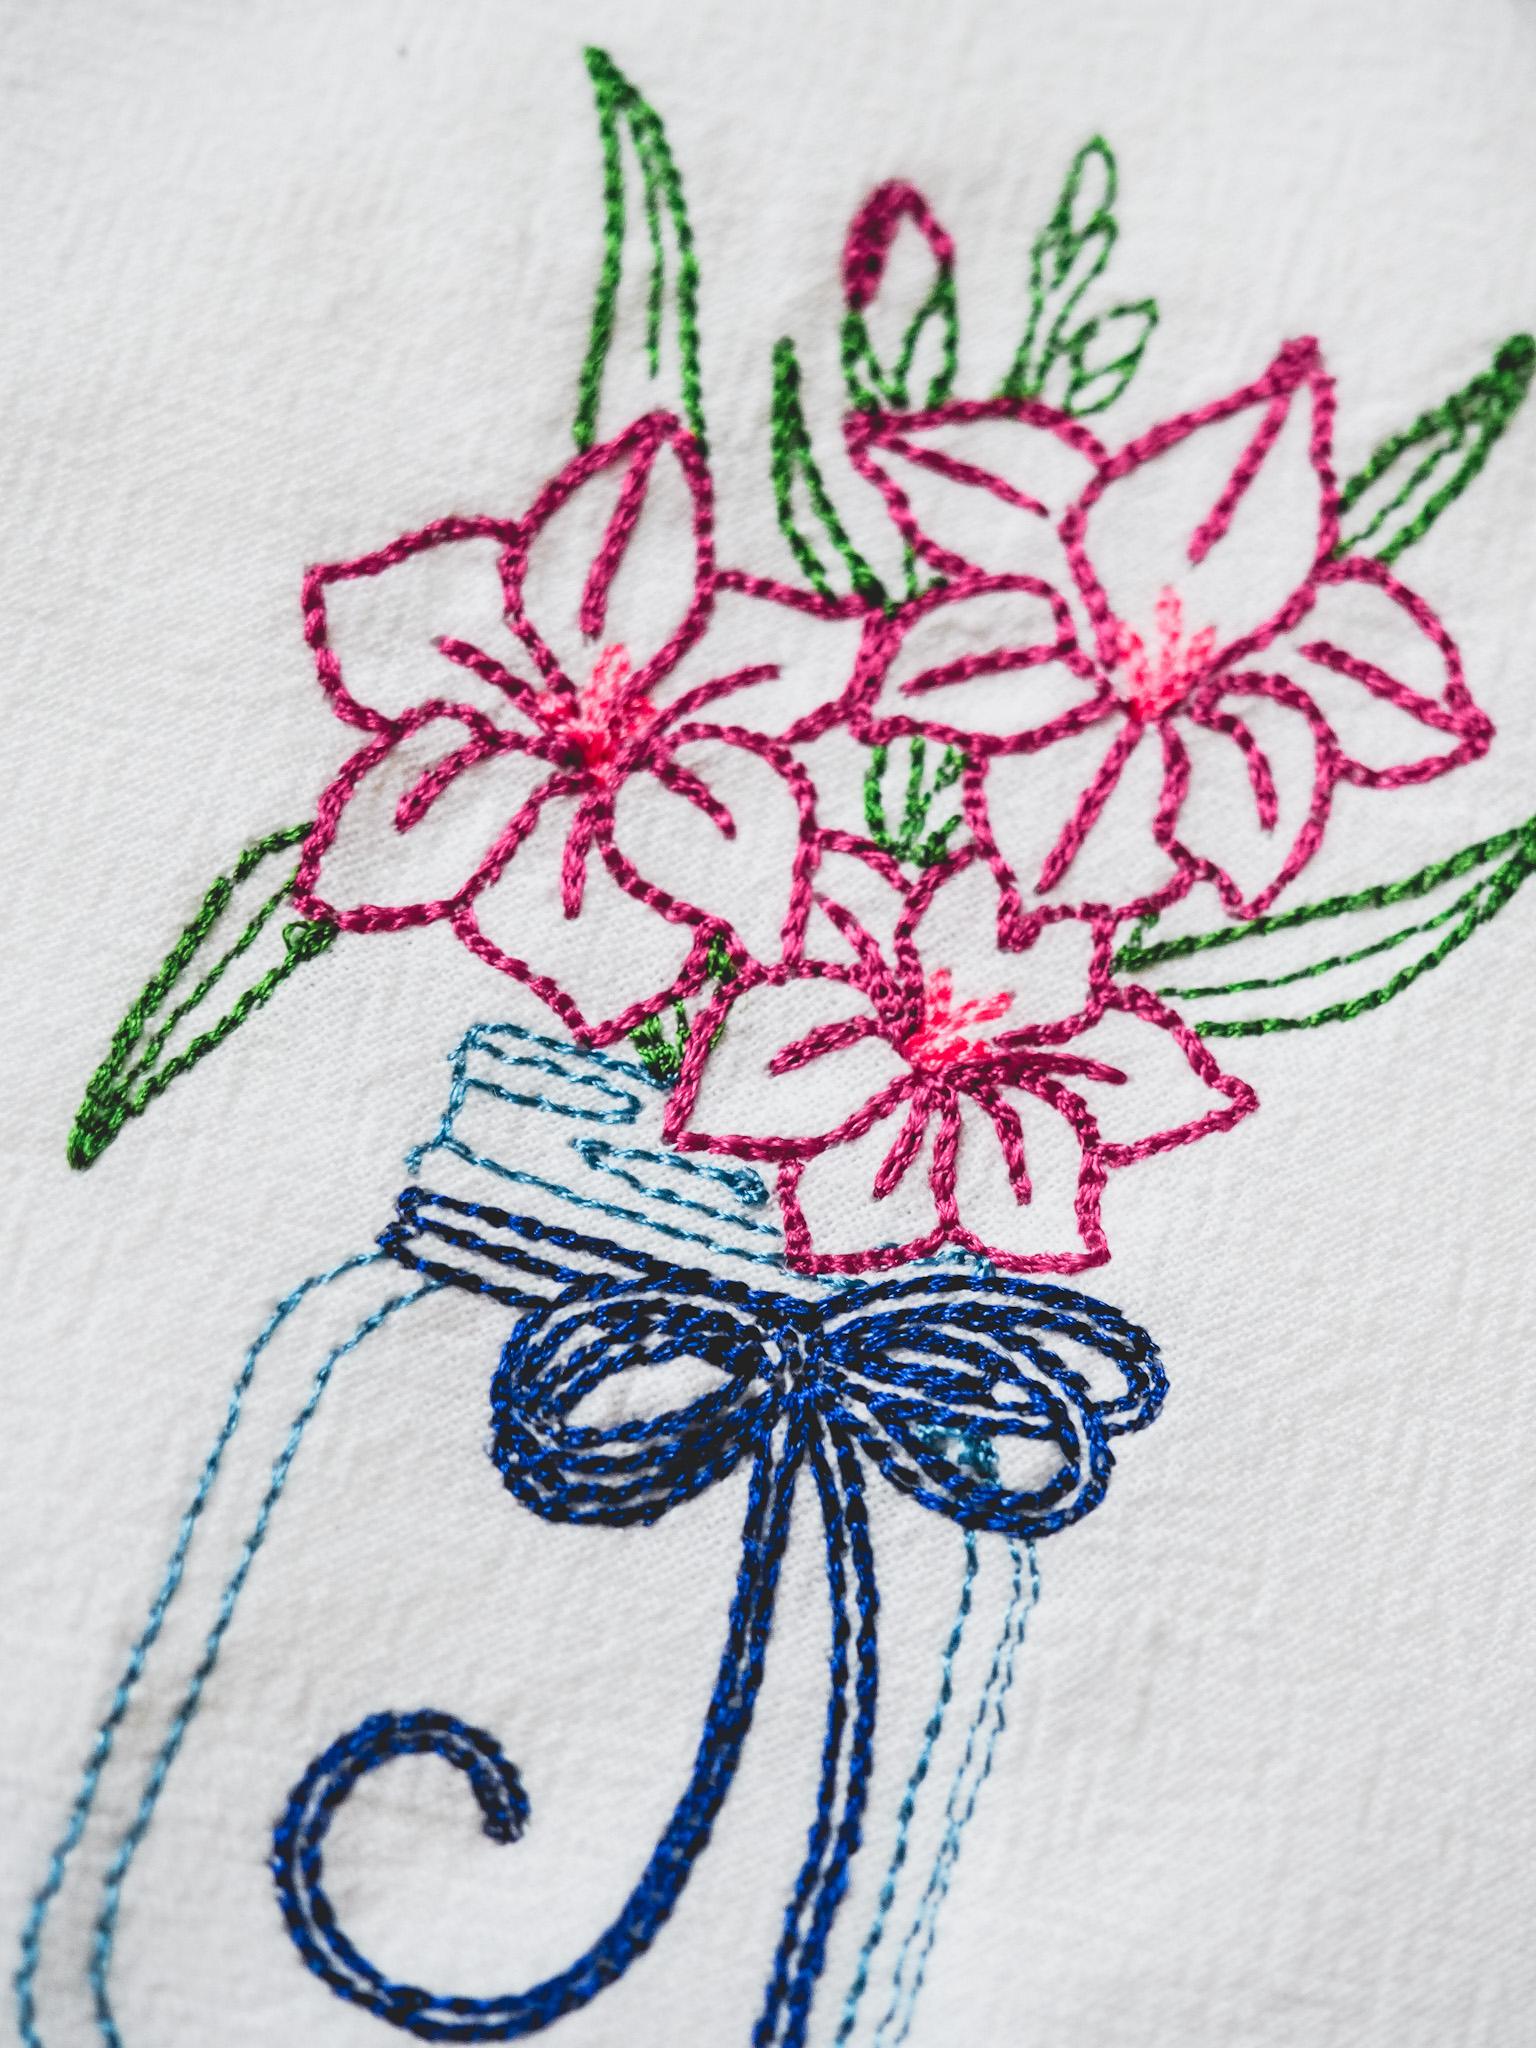 Flower Towel, Close up of Thread, Pretty Stitch work, stitches, Pink flowers, Mason jar